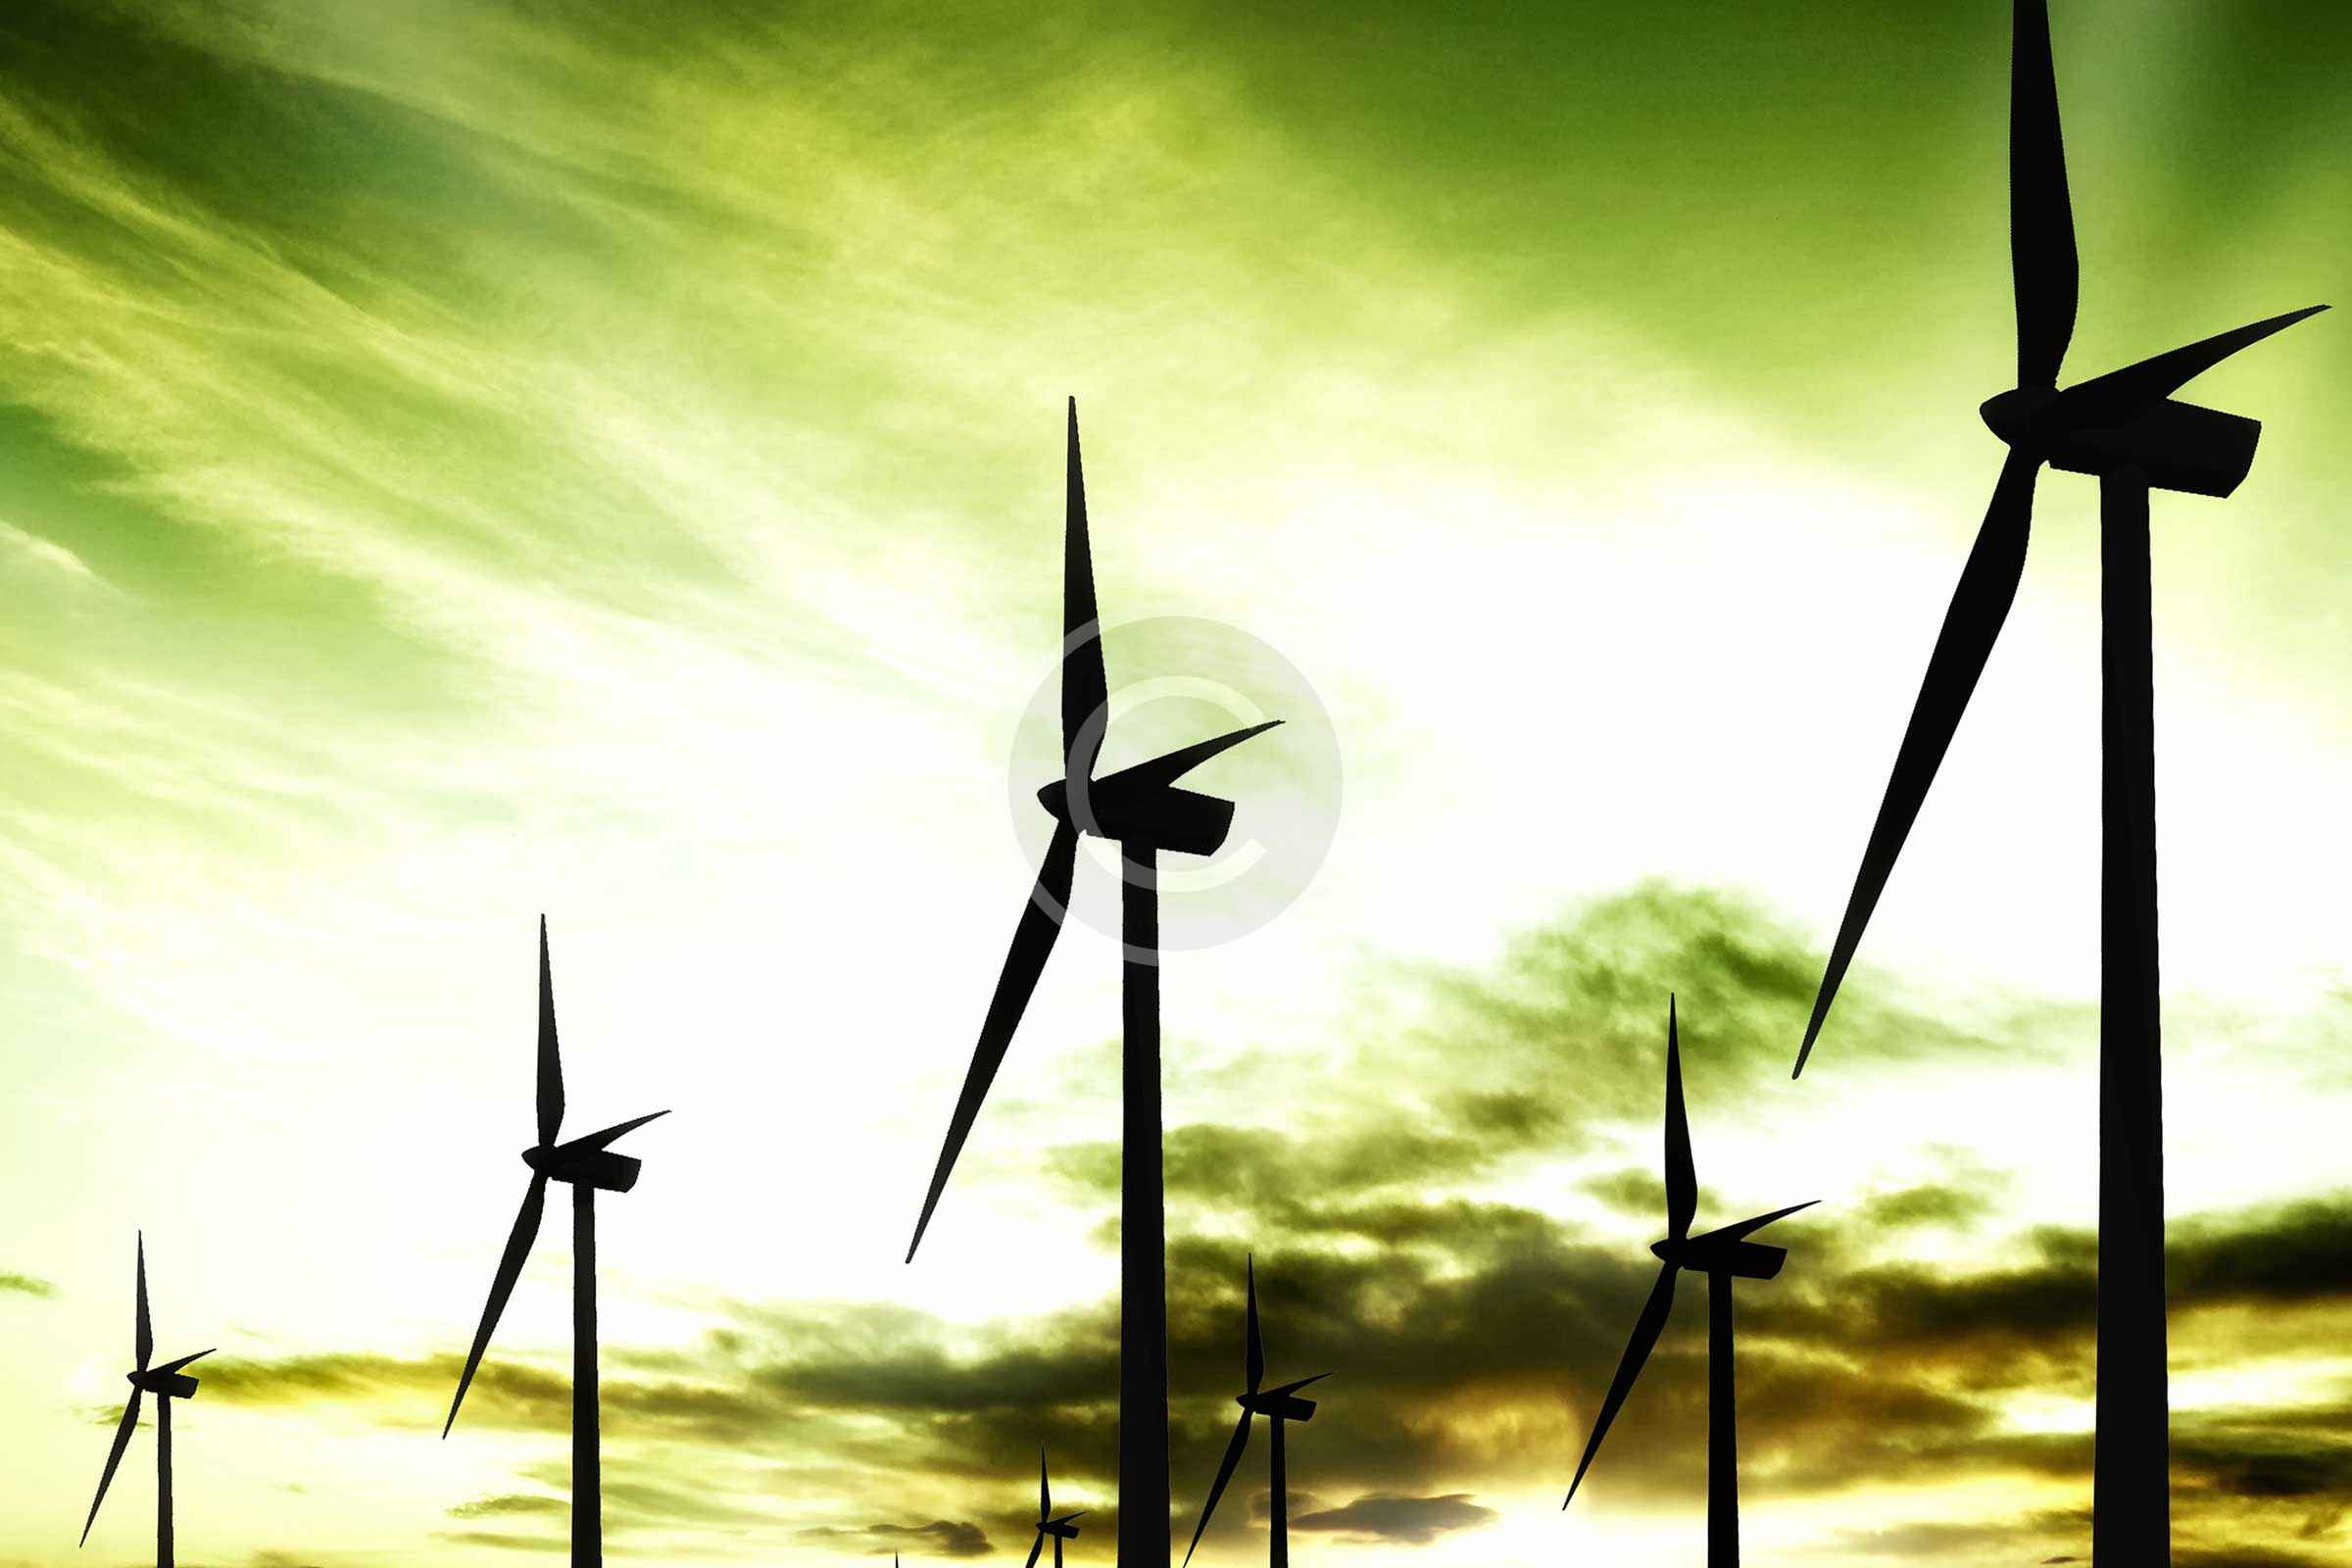 Empowering Community Energy